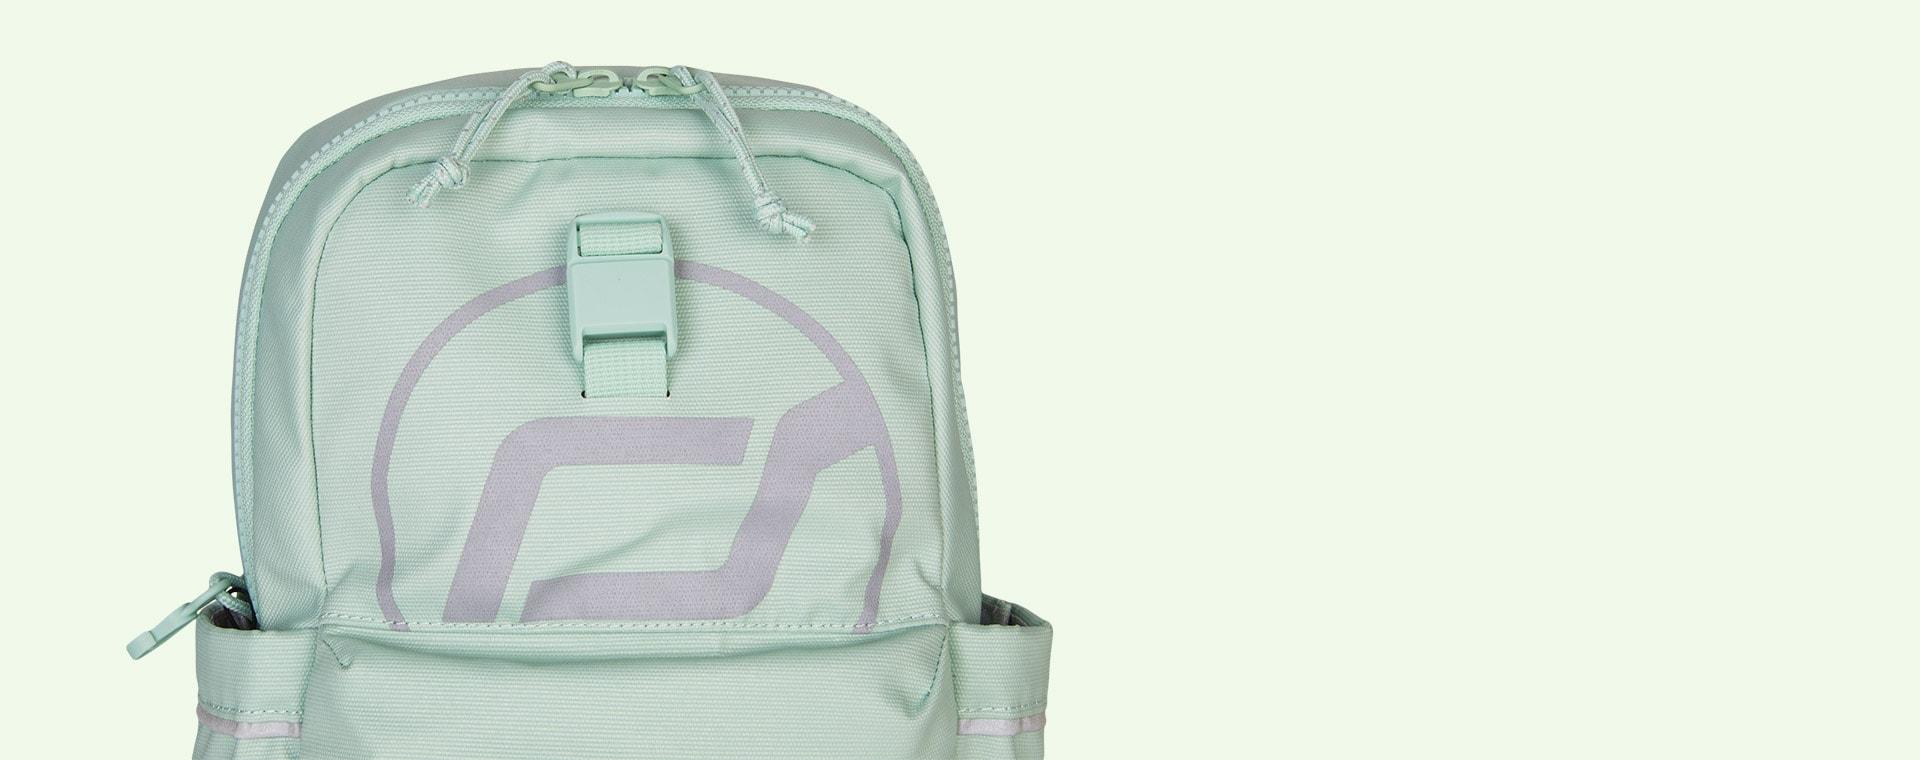 Kiwi Scoot & Ride Backpack